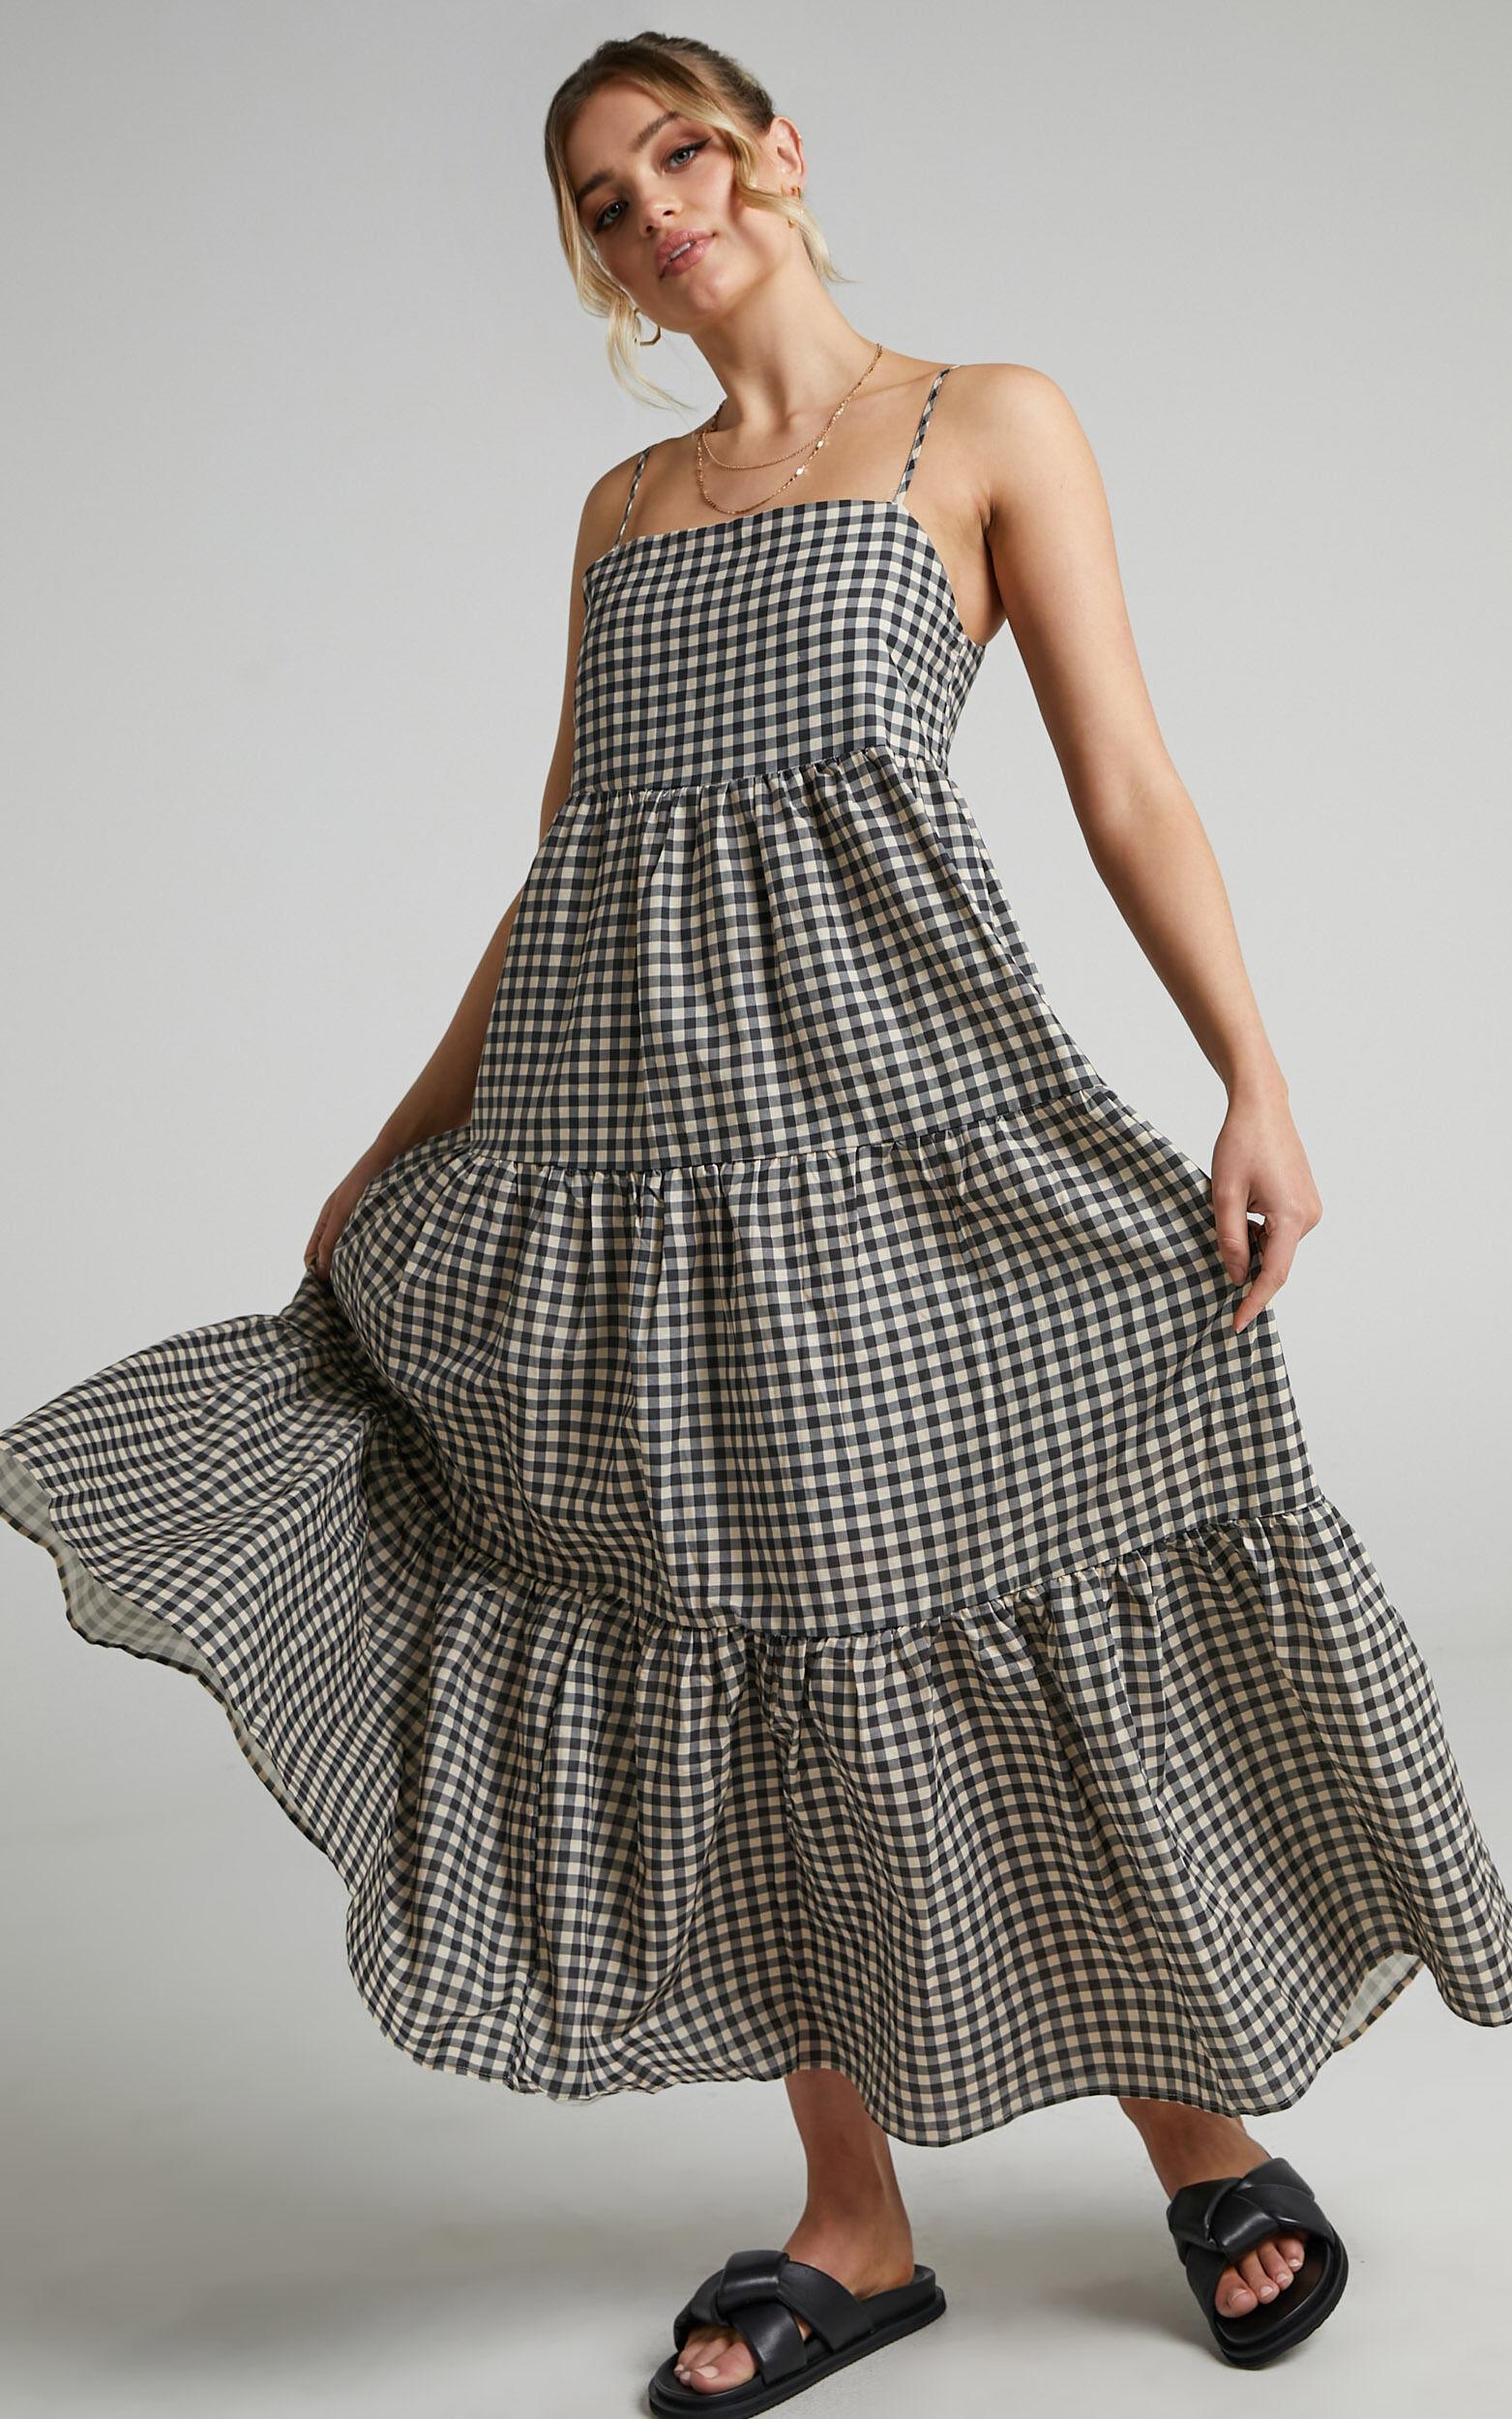 Charlie Holiday - Isabella Maxi Dress in Gingham - 06, BLK1, super-hi-res image number null